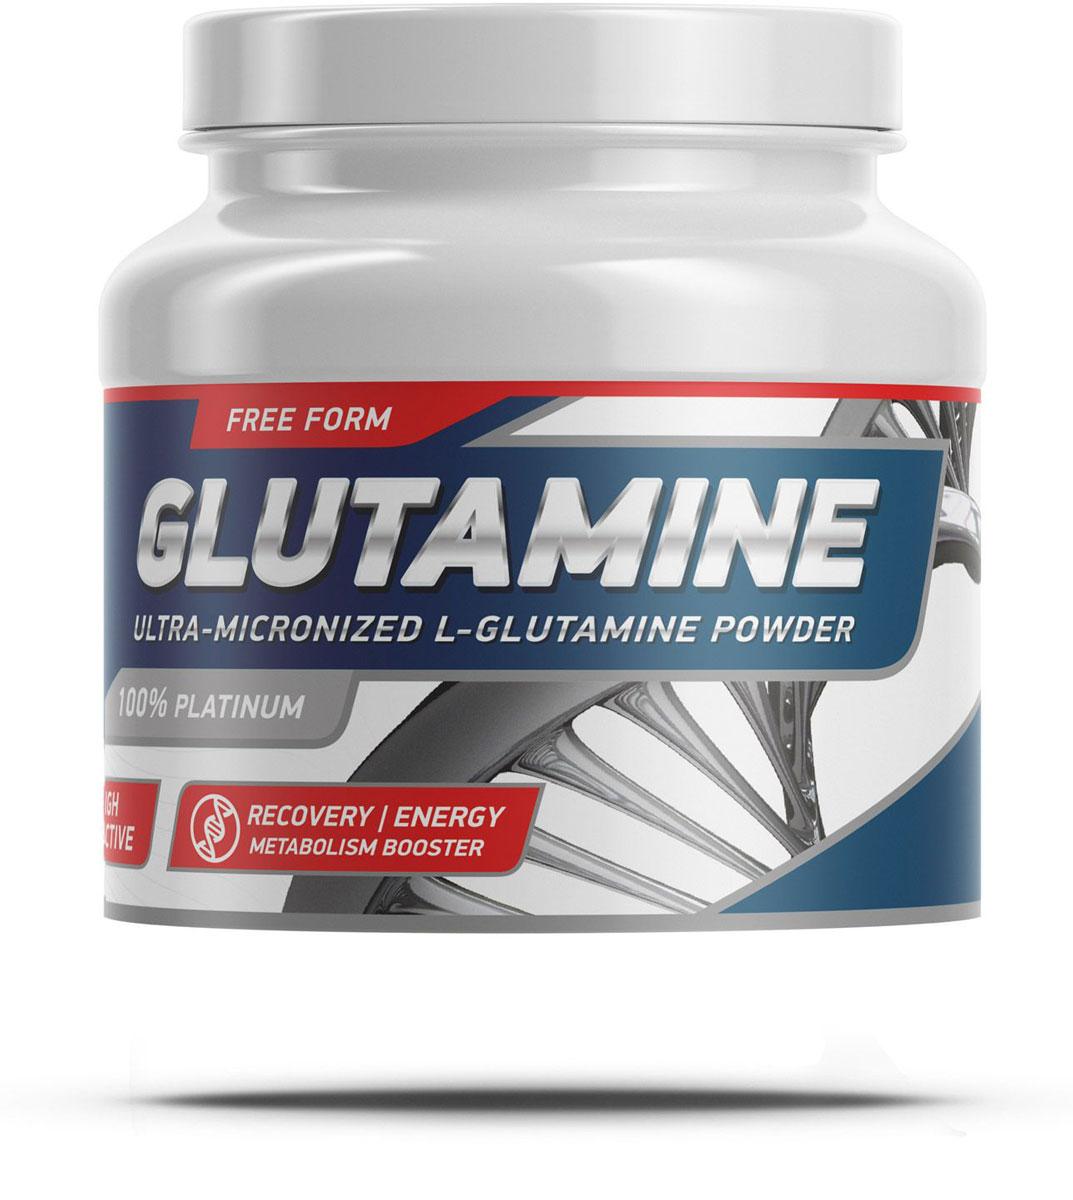 Аминокислоты Geneticlab Nutrition Glutamine Powder, без вкуса, 500 г аминокислоты geneticlab nutrition glutamine powder без вкуса 500 г